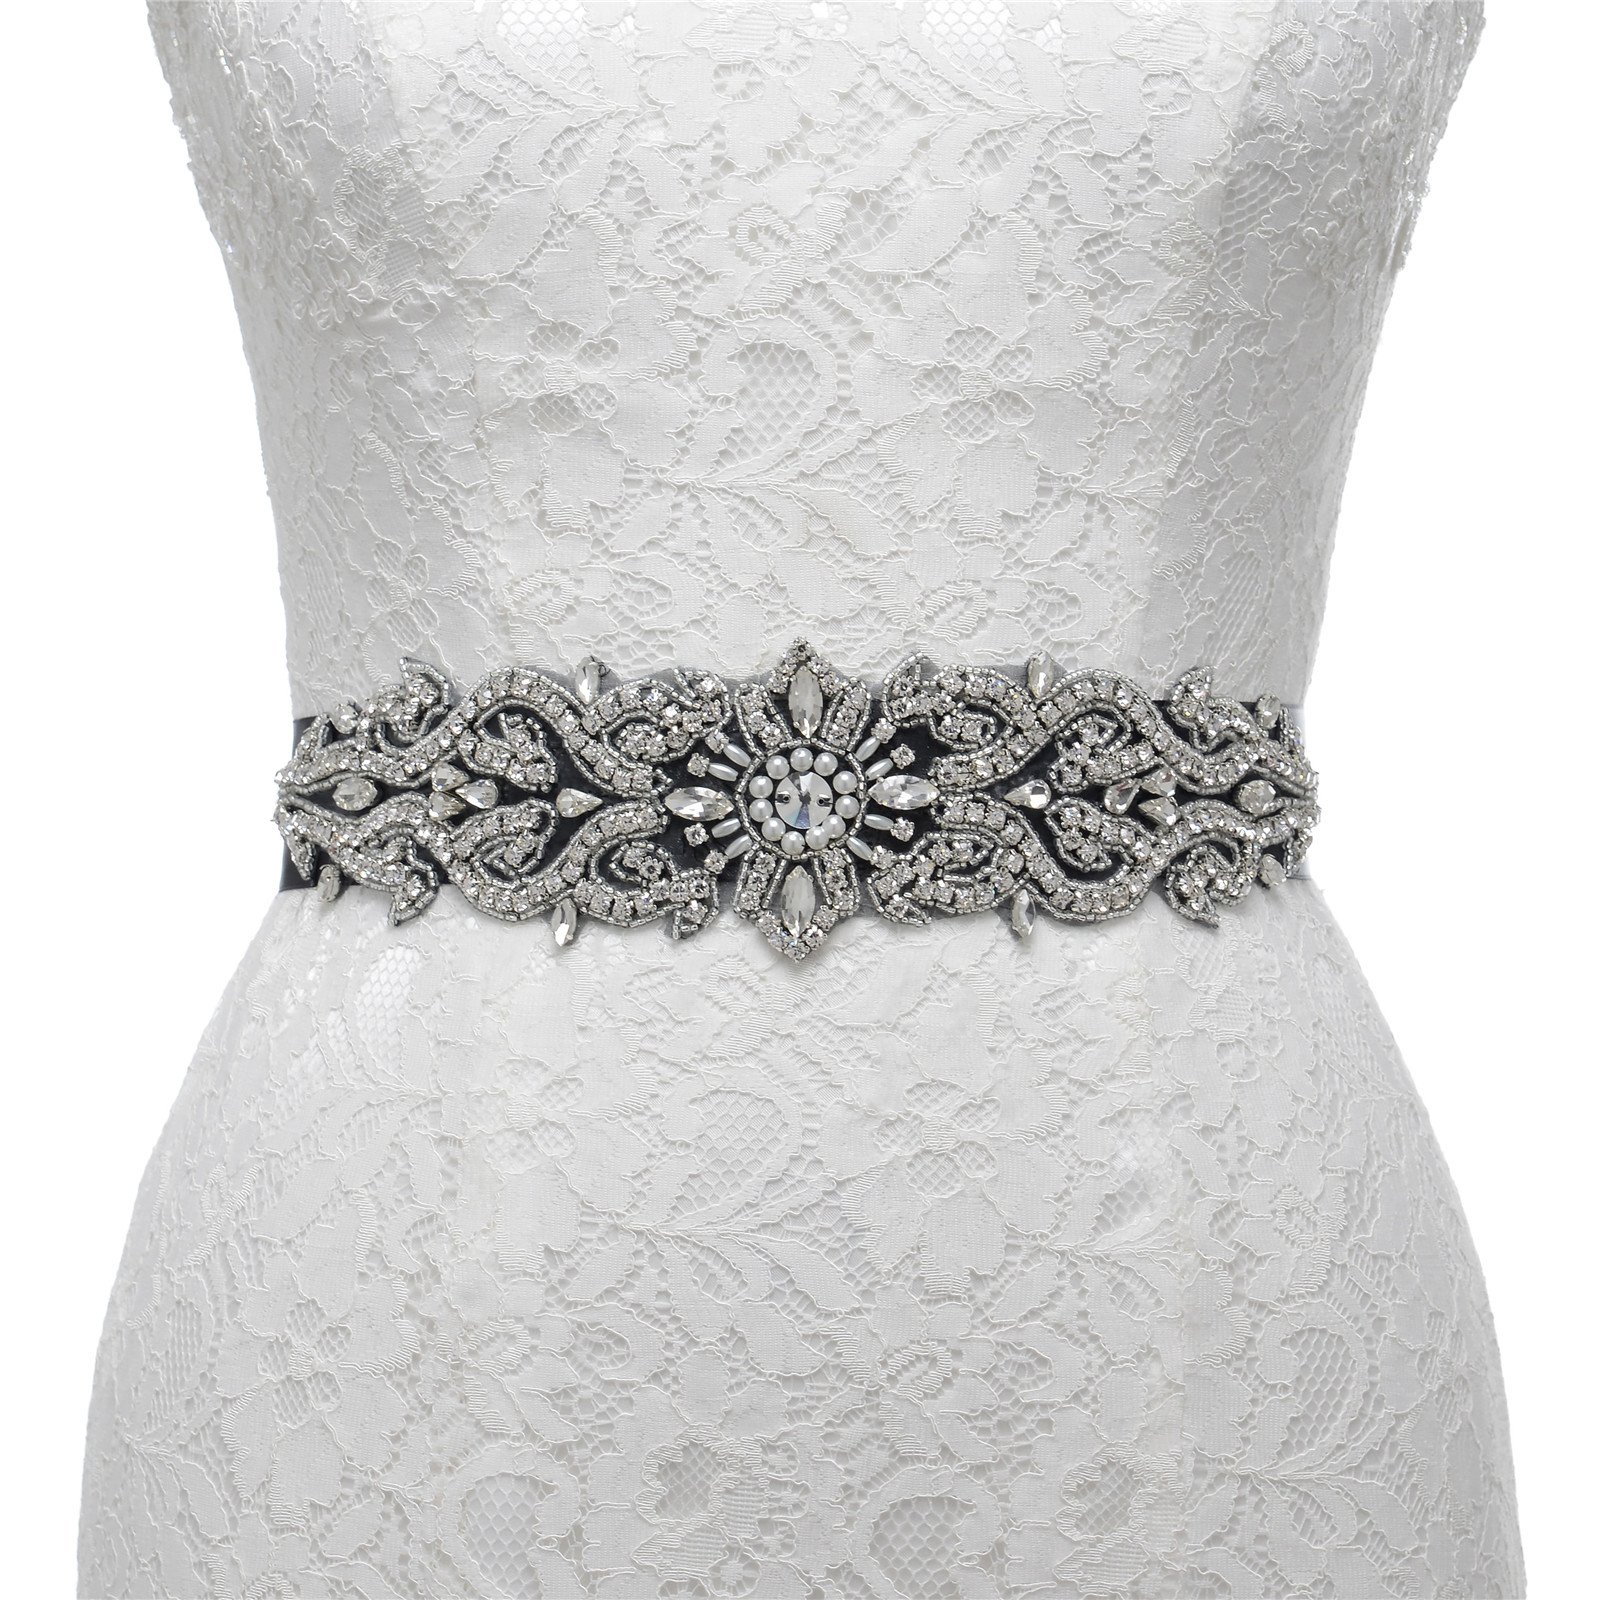 AW Bridal Sash Wedding Belt - Crystal Belt for Wedding Dress - Silver Women Belt for Prom Party Dress